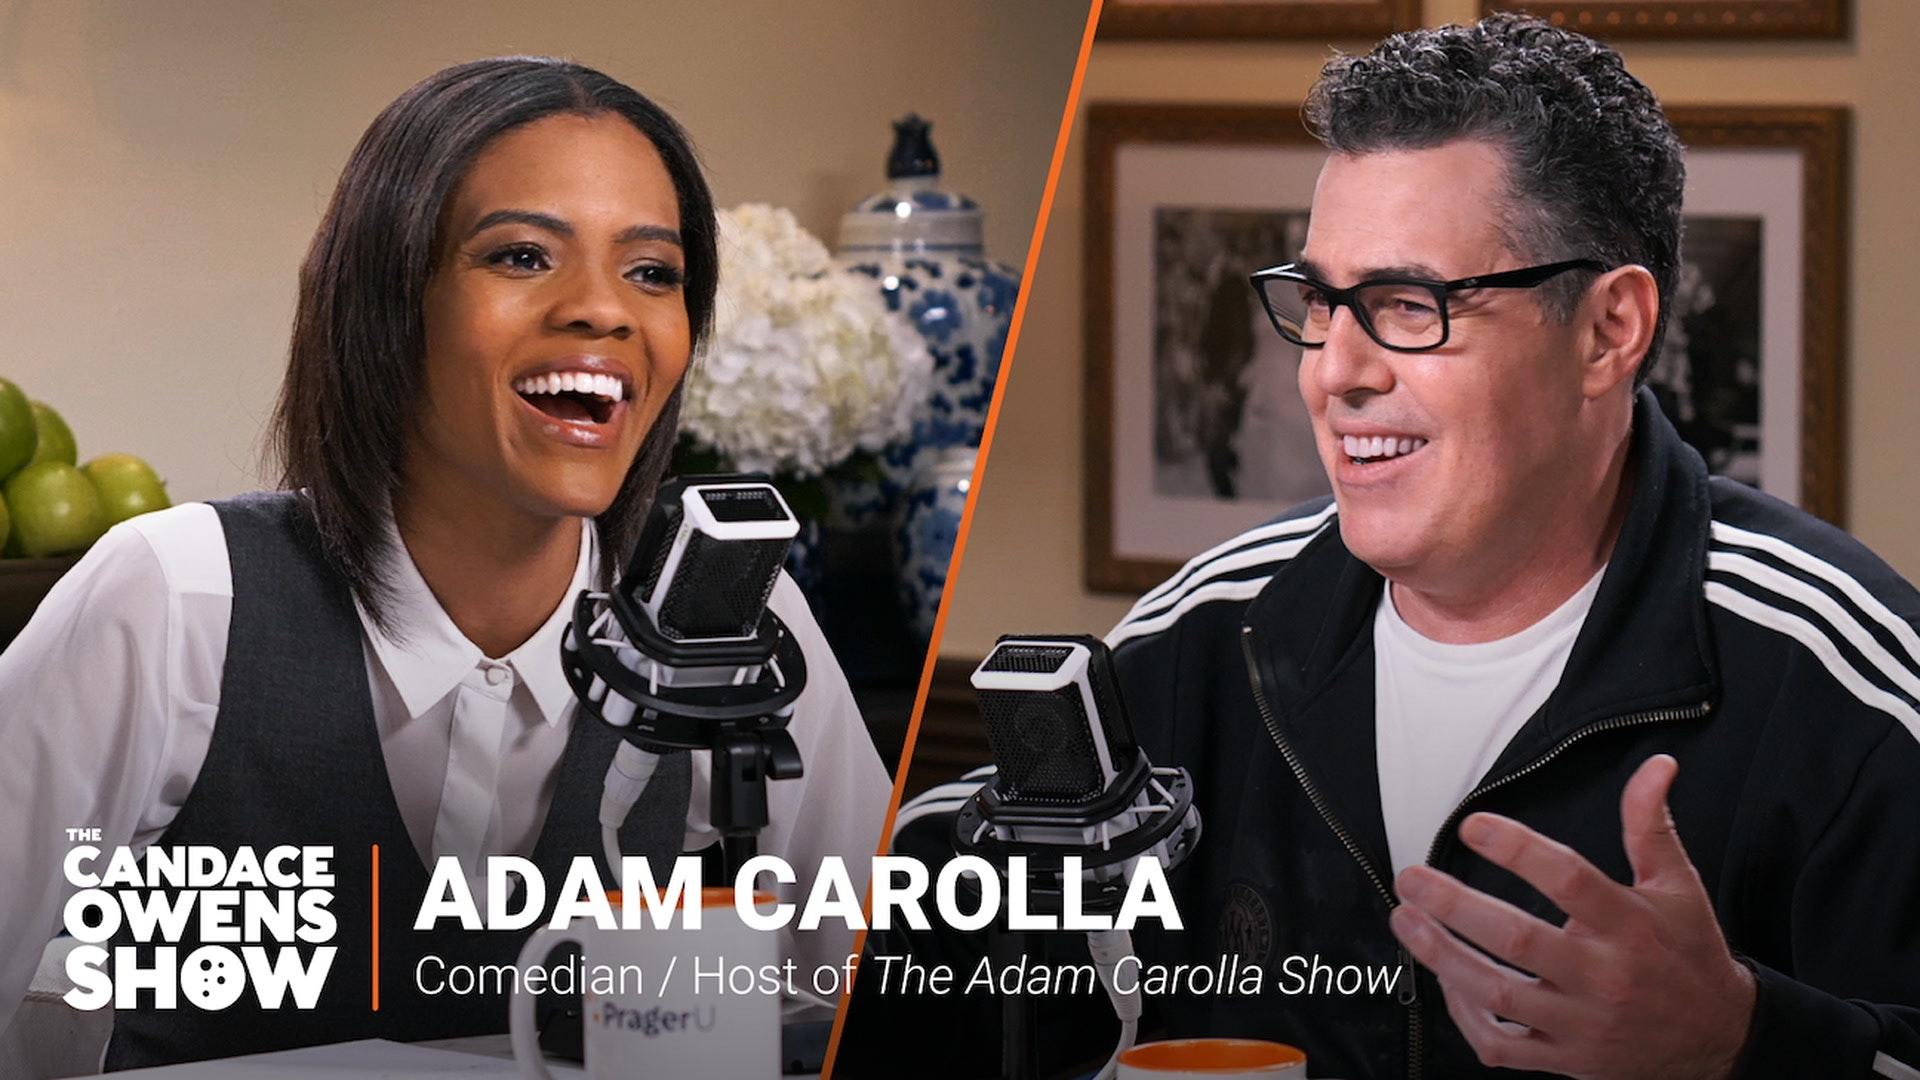 The Candace Owens Show: Adam Carolla